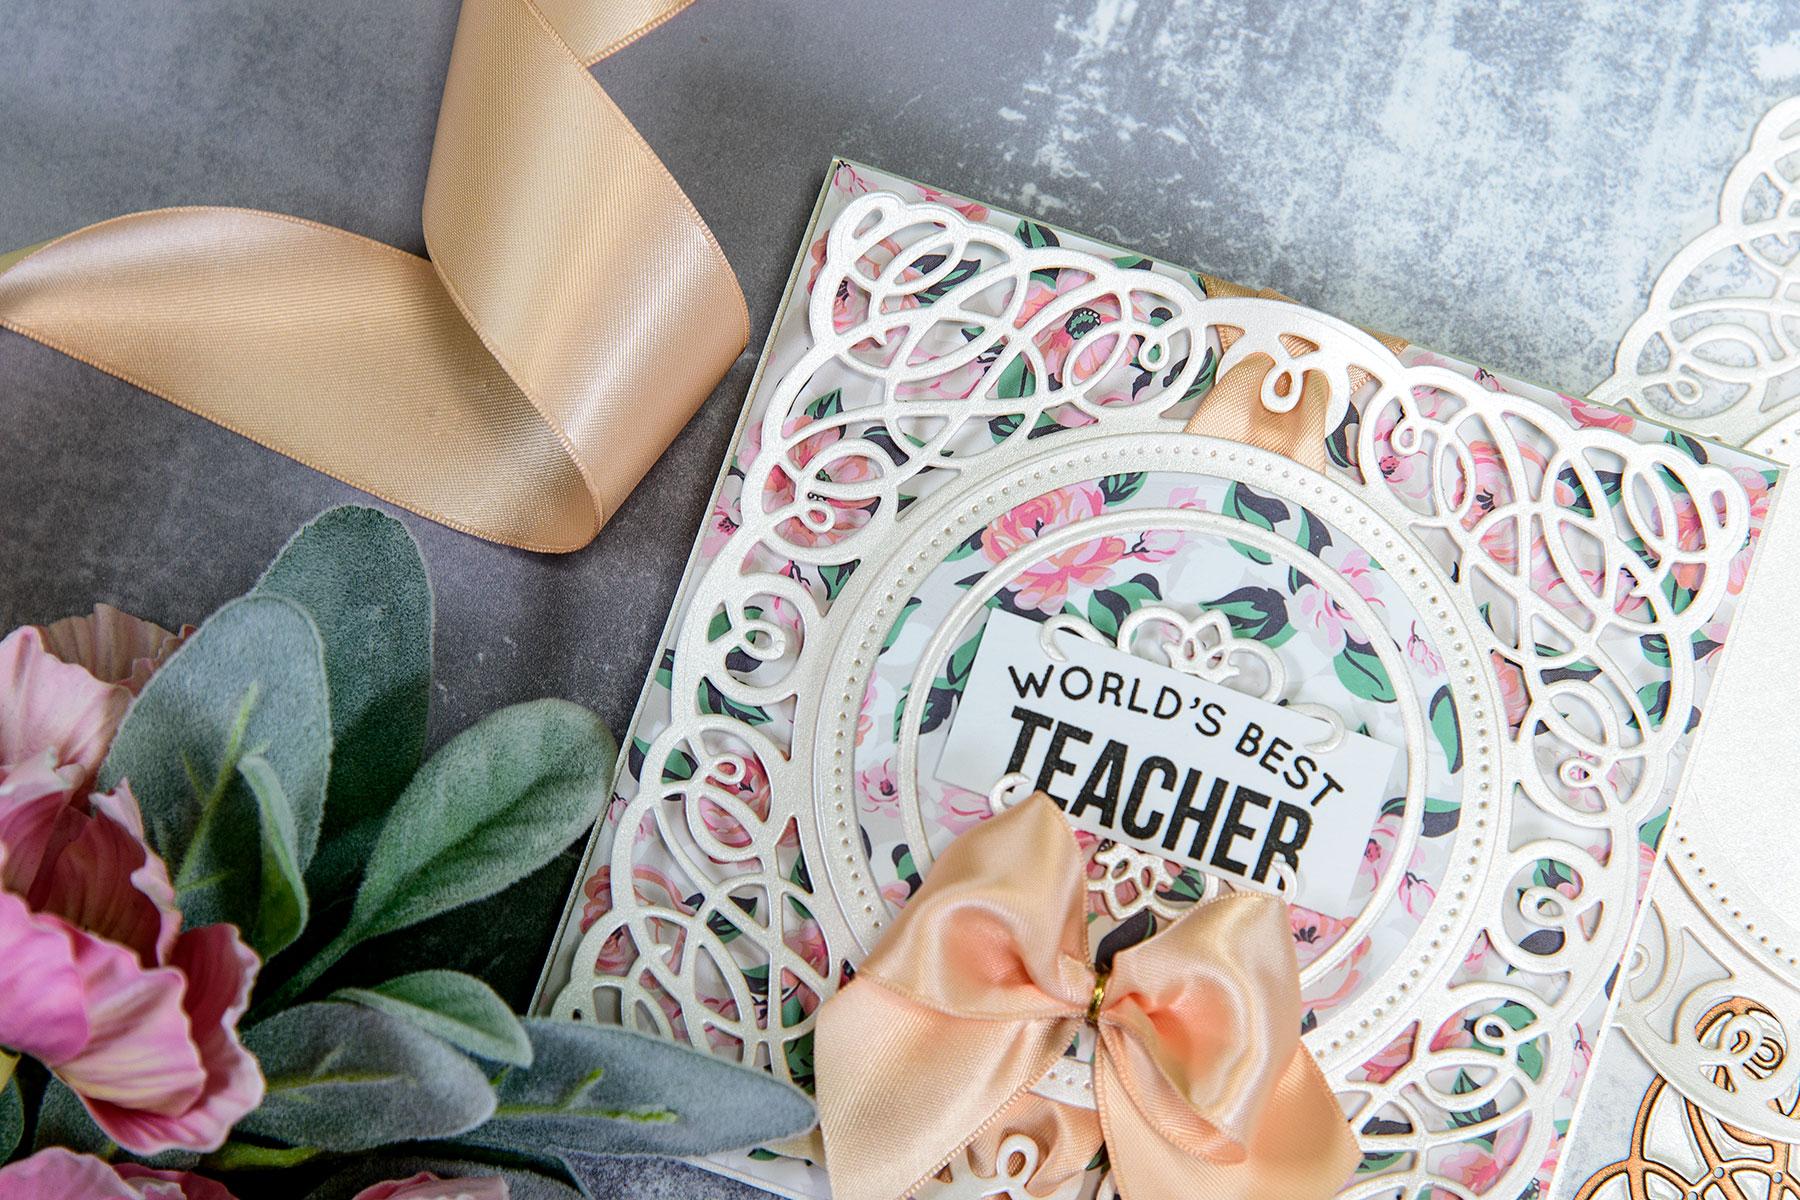 Layered Dimensional Die Cutting. Episode #2 - Teacher Card Pic 5